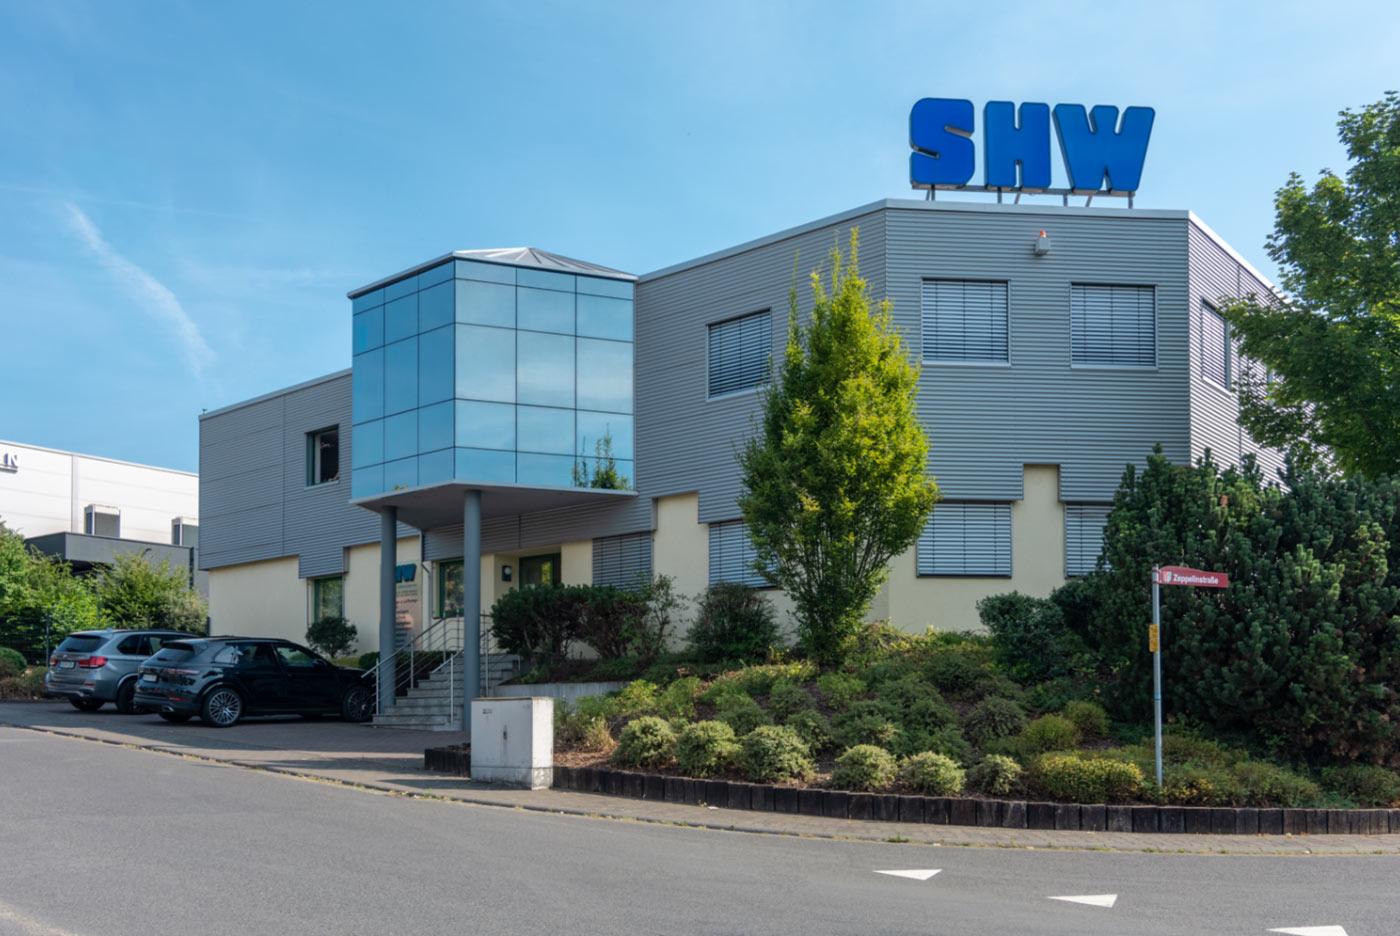 shw, Firmengebäude, Bürogebäude, Büros, Firma, Haibach